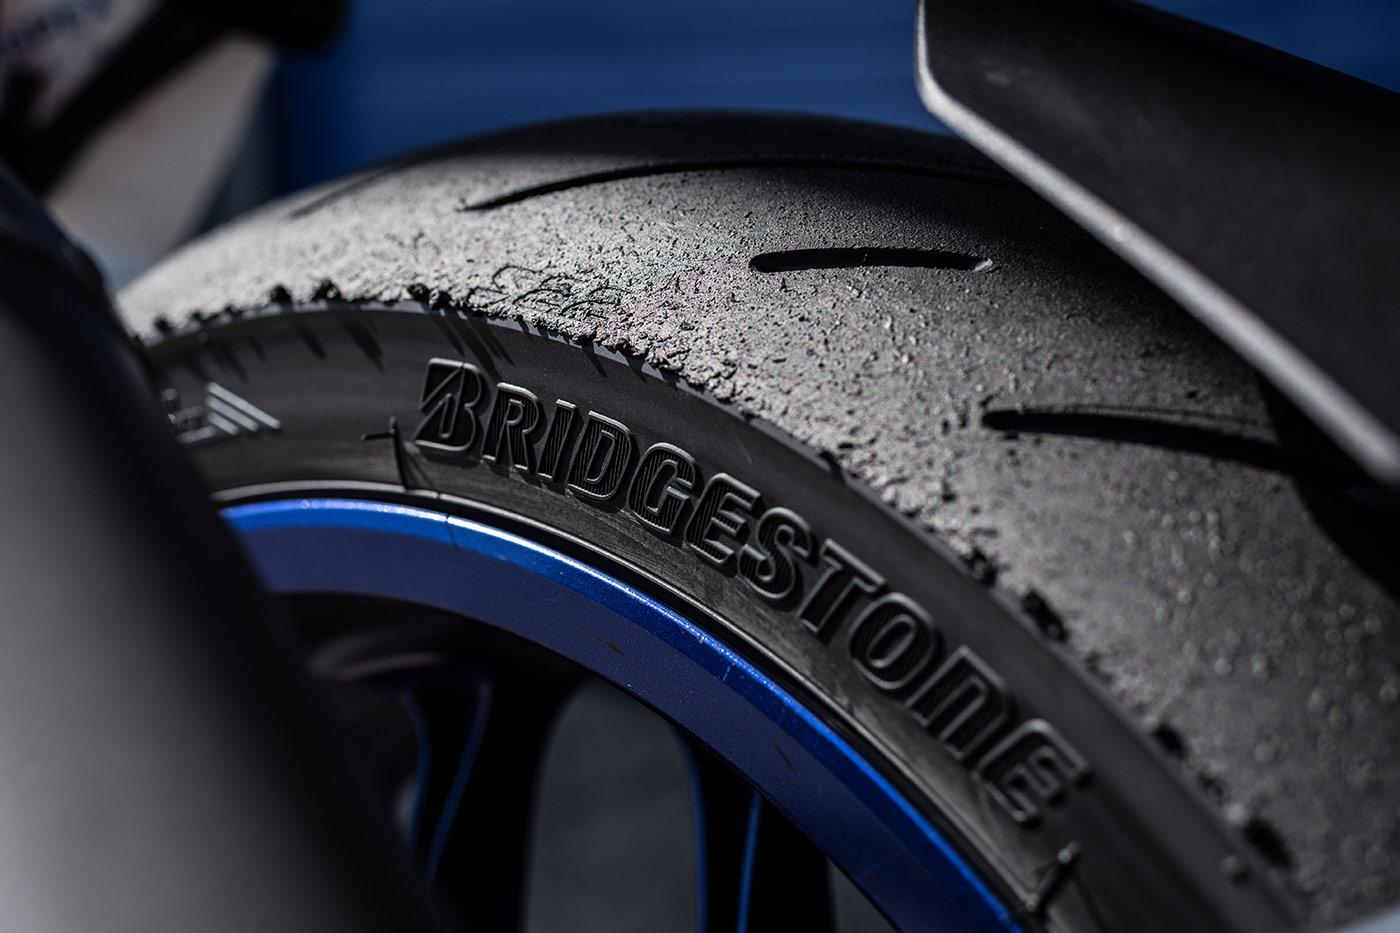 Prova gomme: Bridgestone S22 – livello superiore - SuperBike